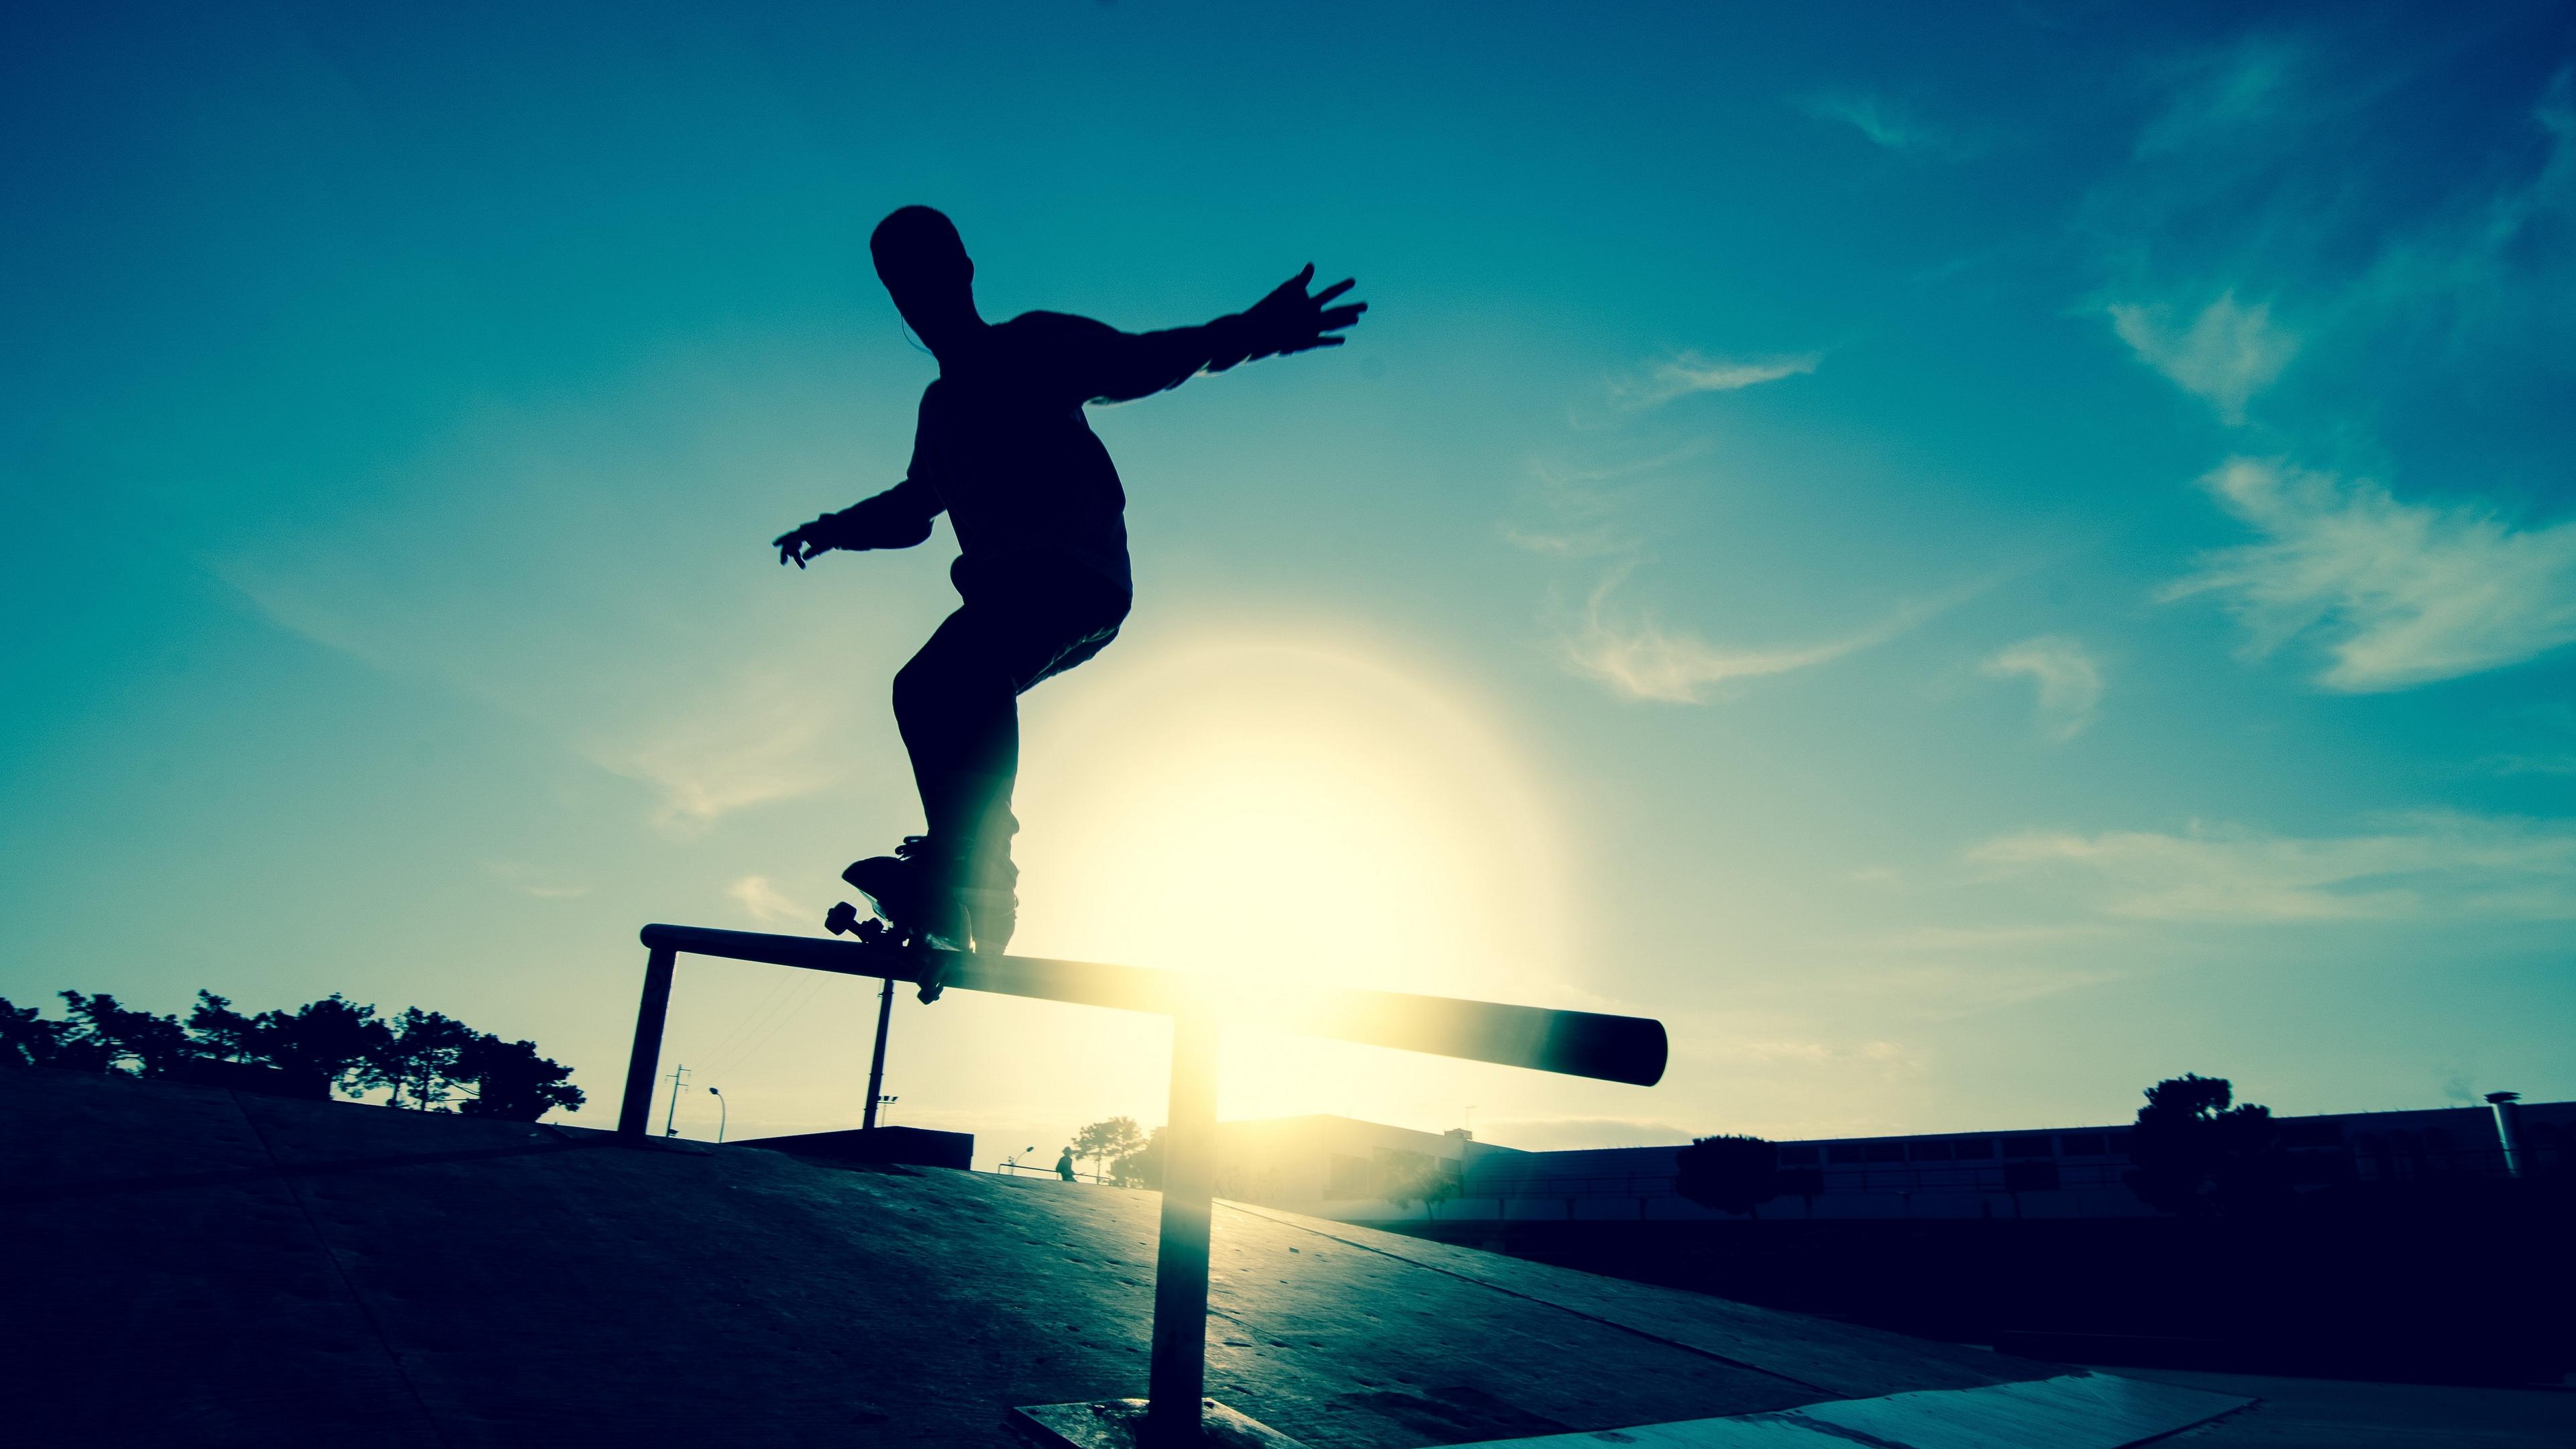 skate board athlete railings motion silhouette ice rink 4k 1540063417 - skate, board, athlete, railings, motion, silhouette, ice rink 4k - skate, board, Athlete